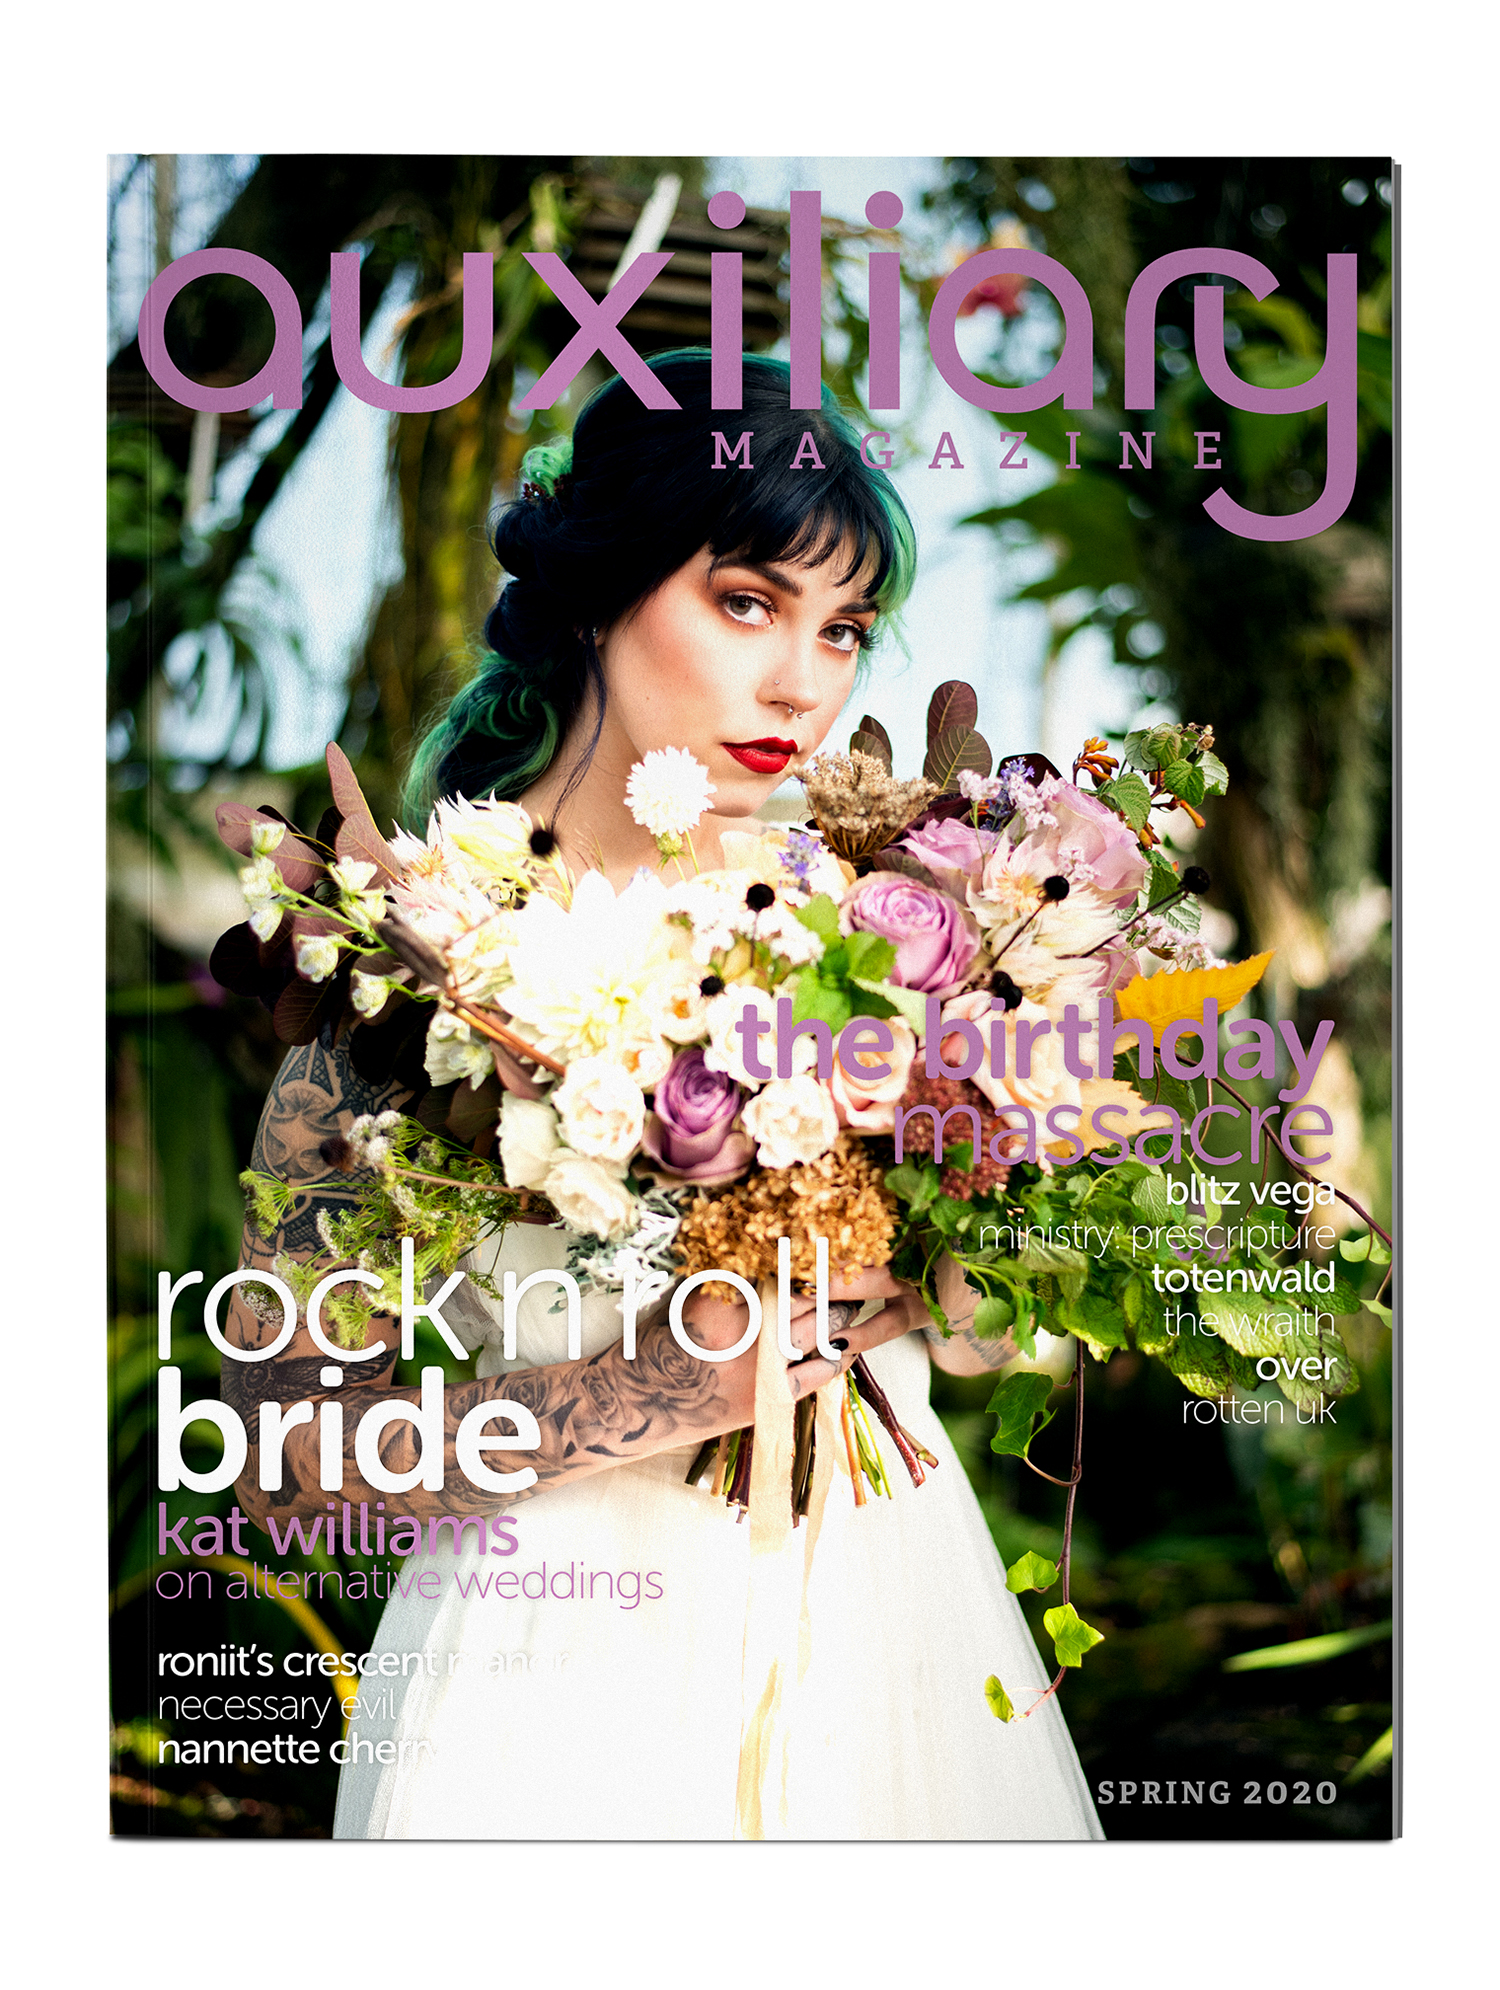 Auxiliary Magazine Spring 2020 Print Edition